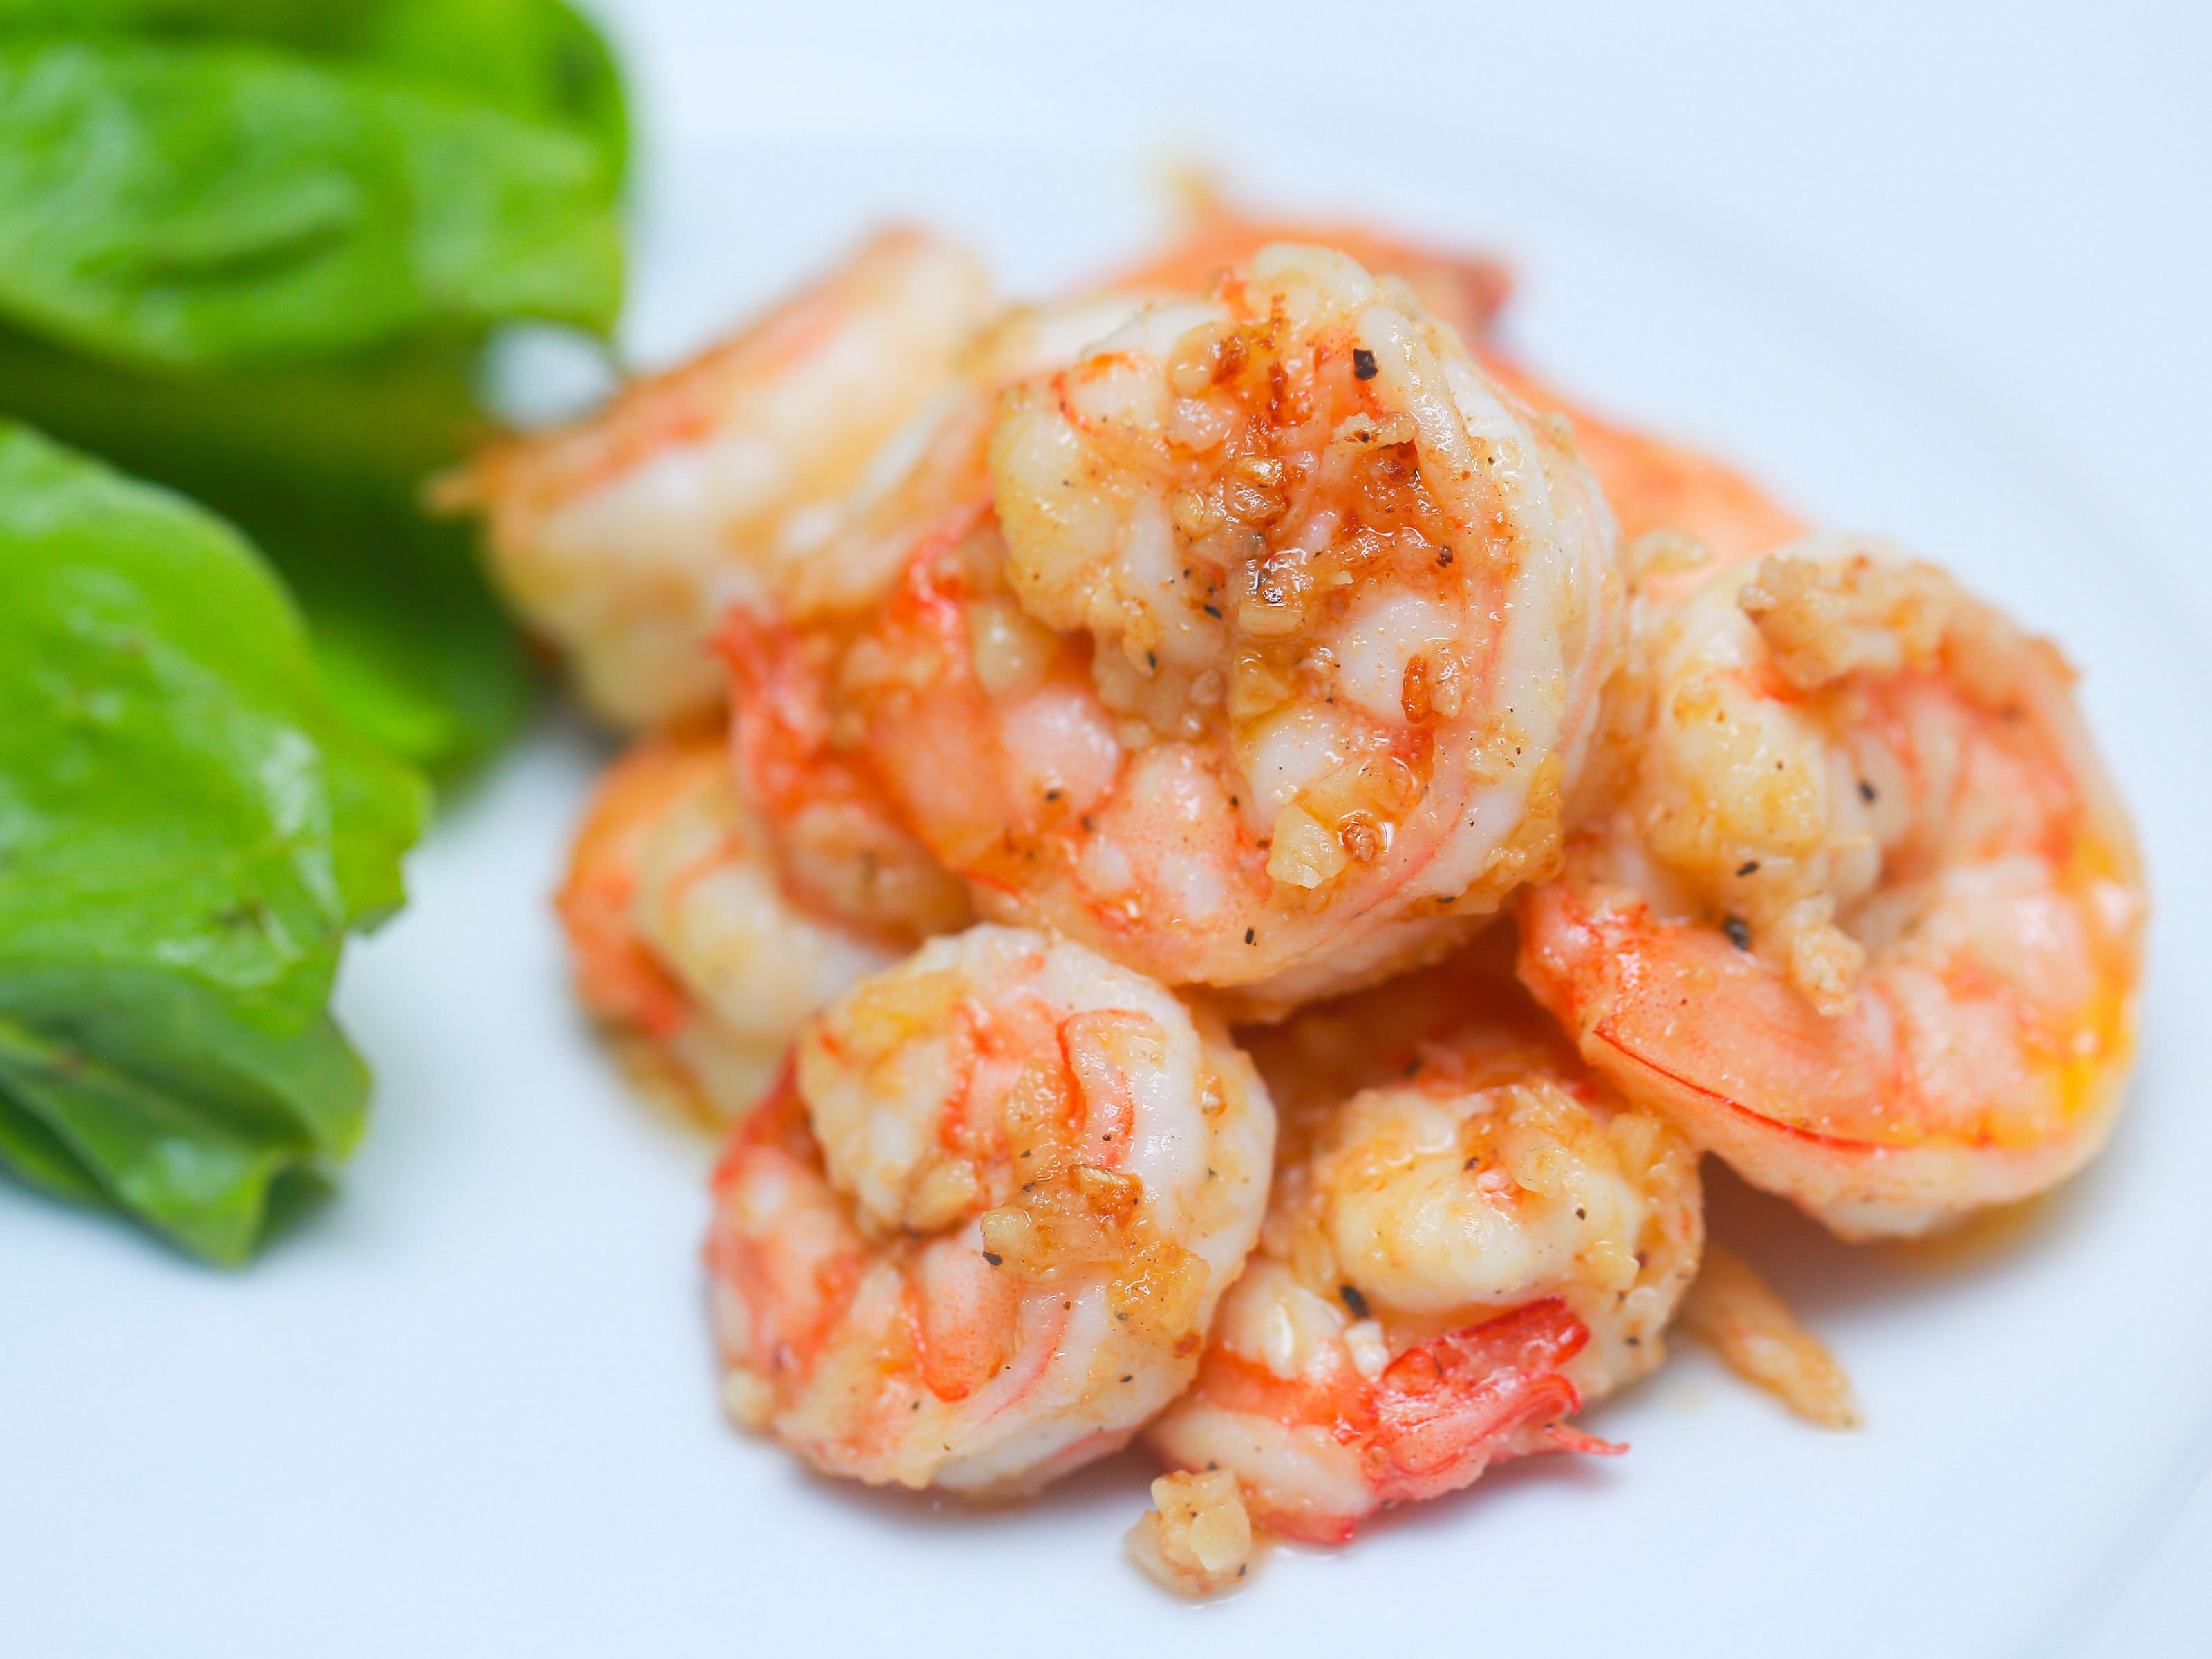 Prawn Meat / Isi Udang (51/60) - 1kg